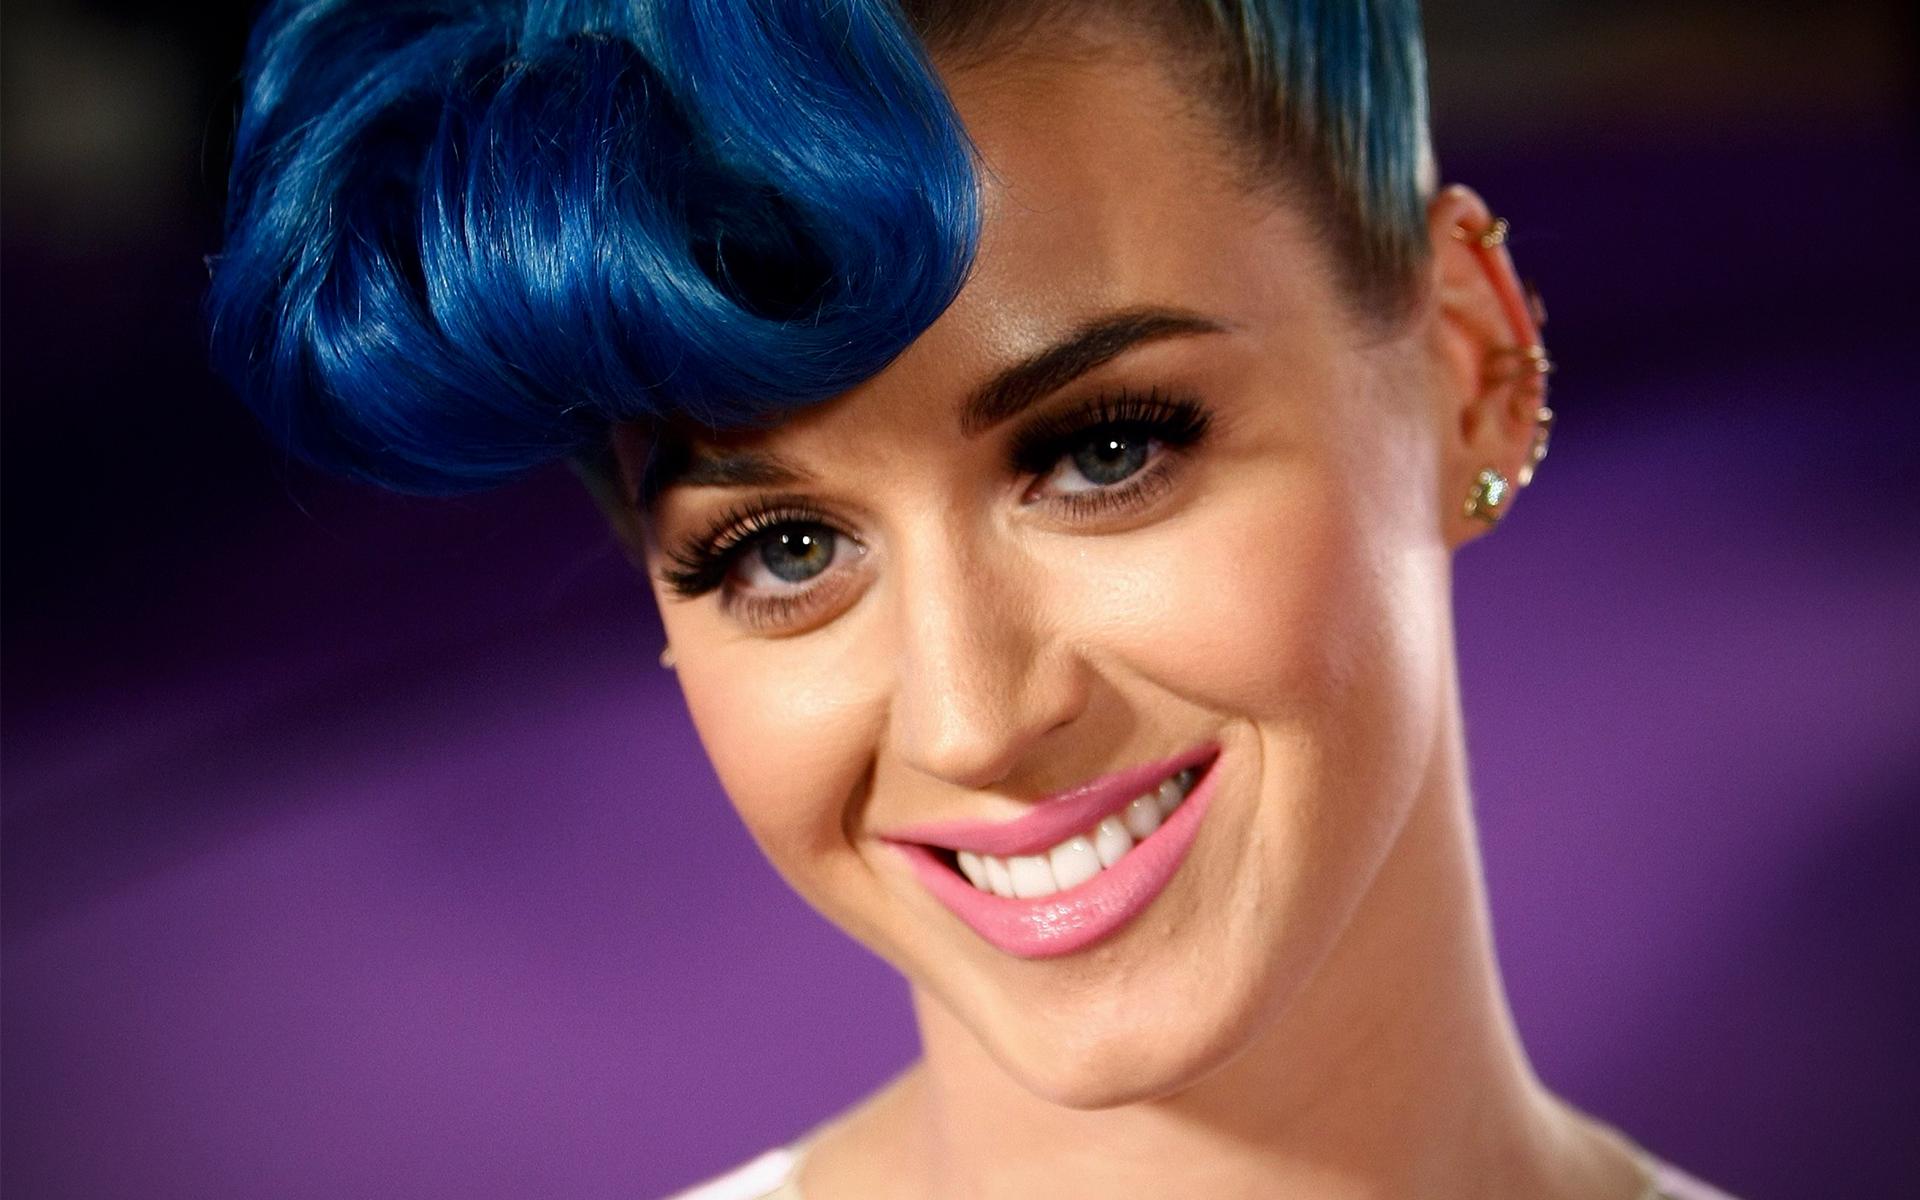 Katy Perry Wallpaper 5